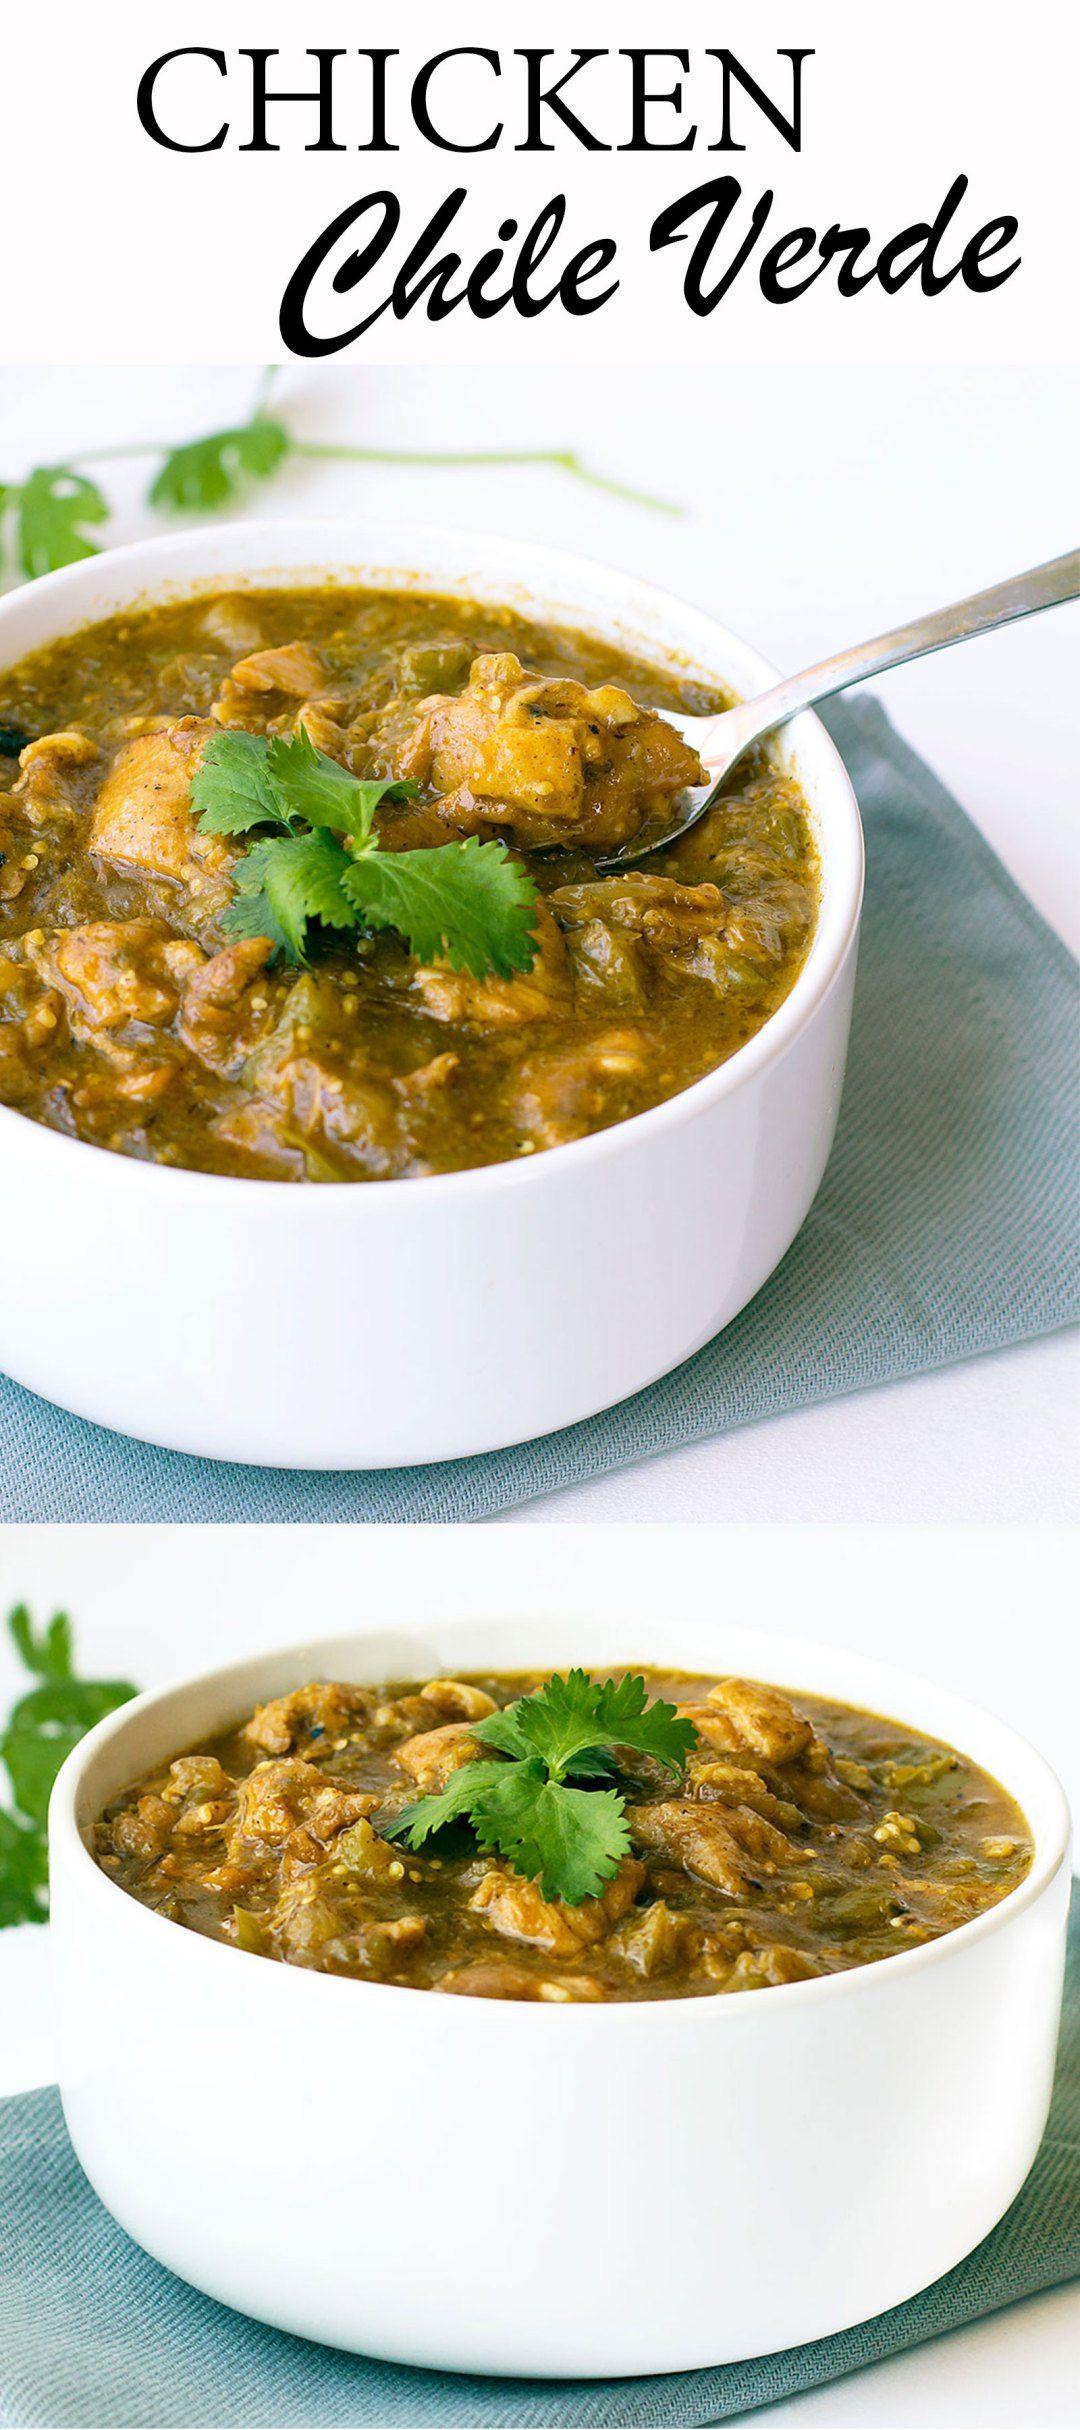 Chicken Chile Verde | Soups & Stews | Pinterest | Cocina saludable ...